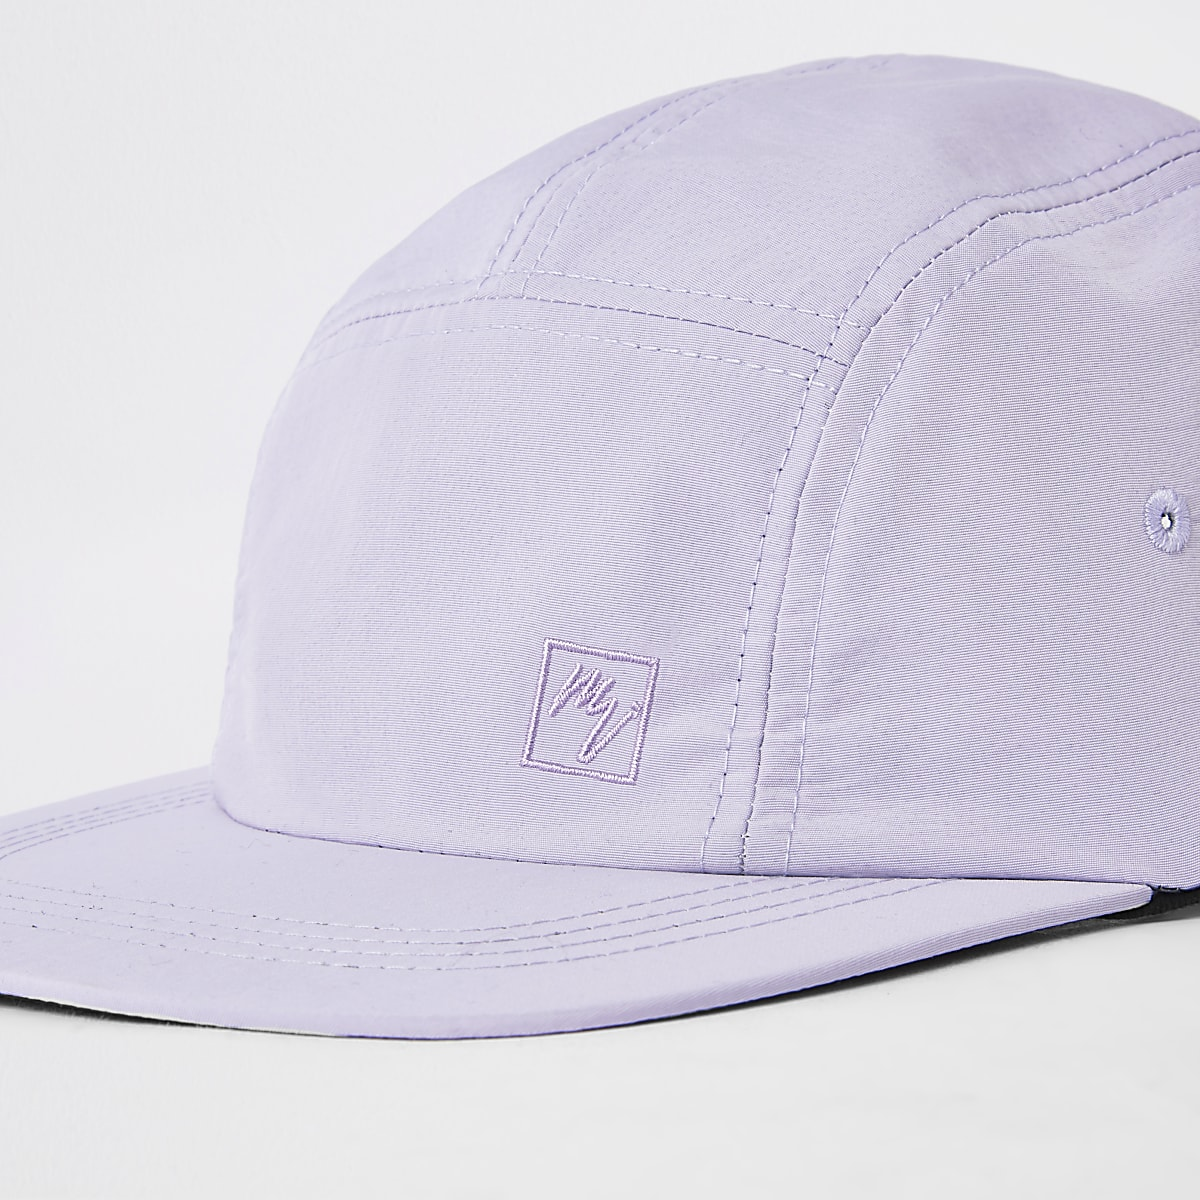 91583b2088e7b Lilac  Maison Riviera  five panel cap - Hats   Caps - Accessories - men